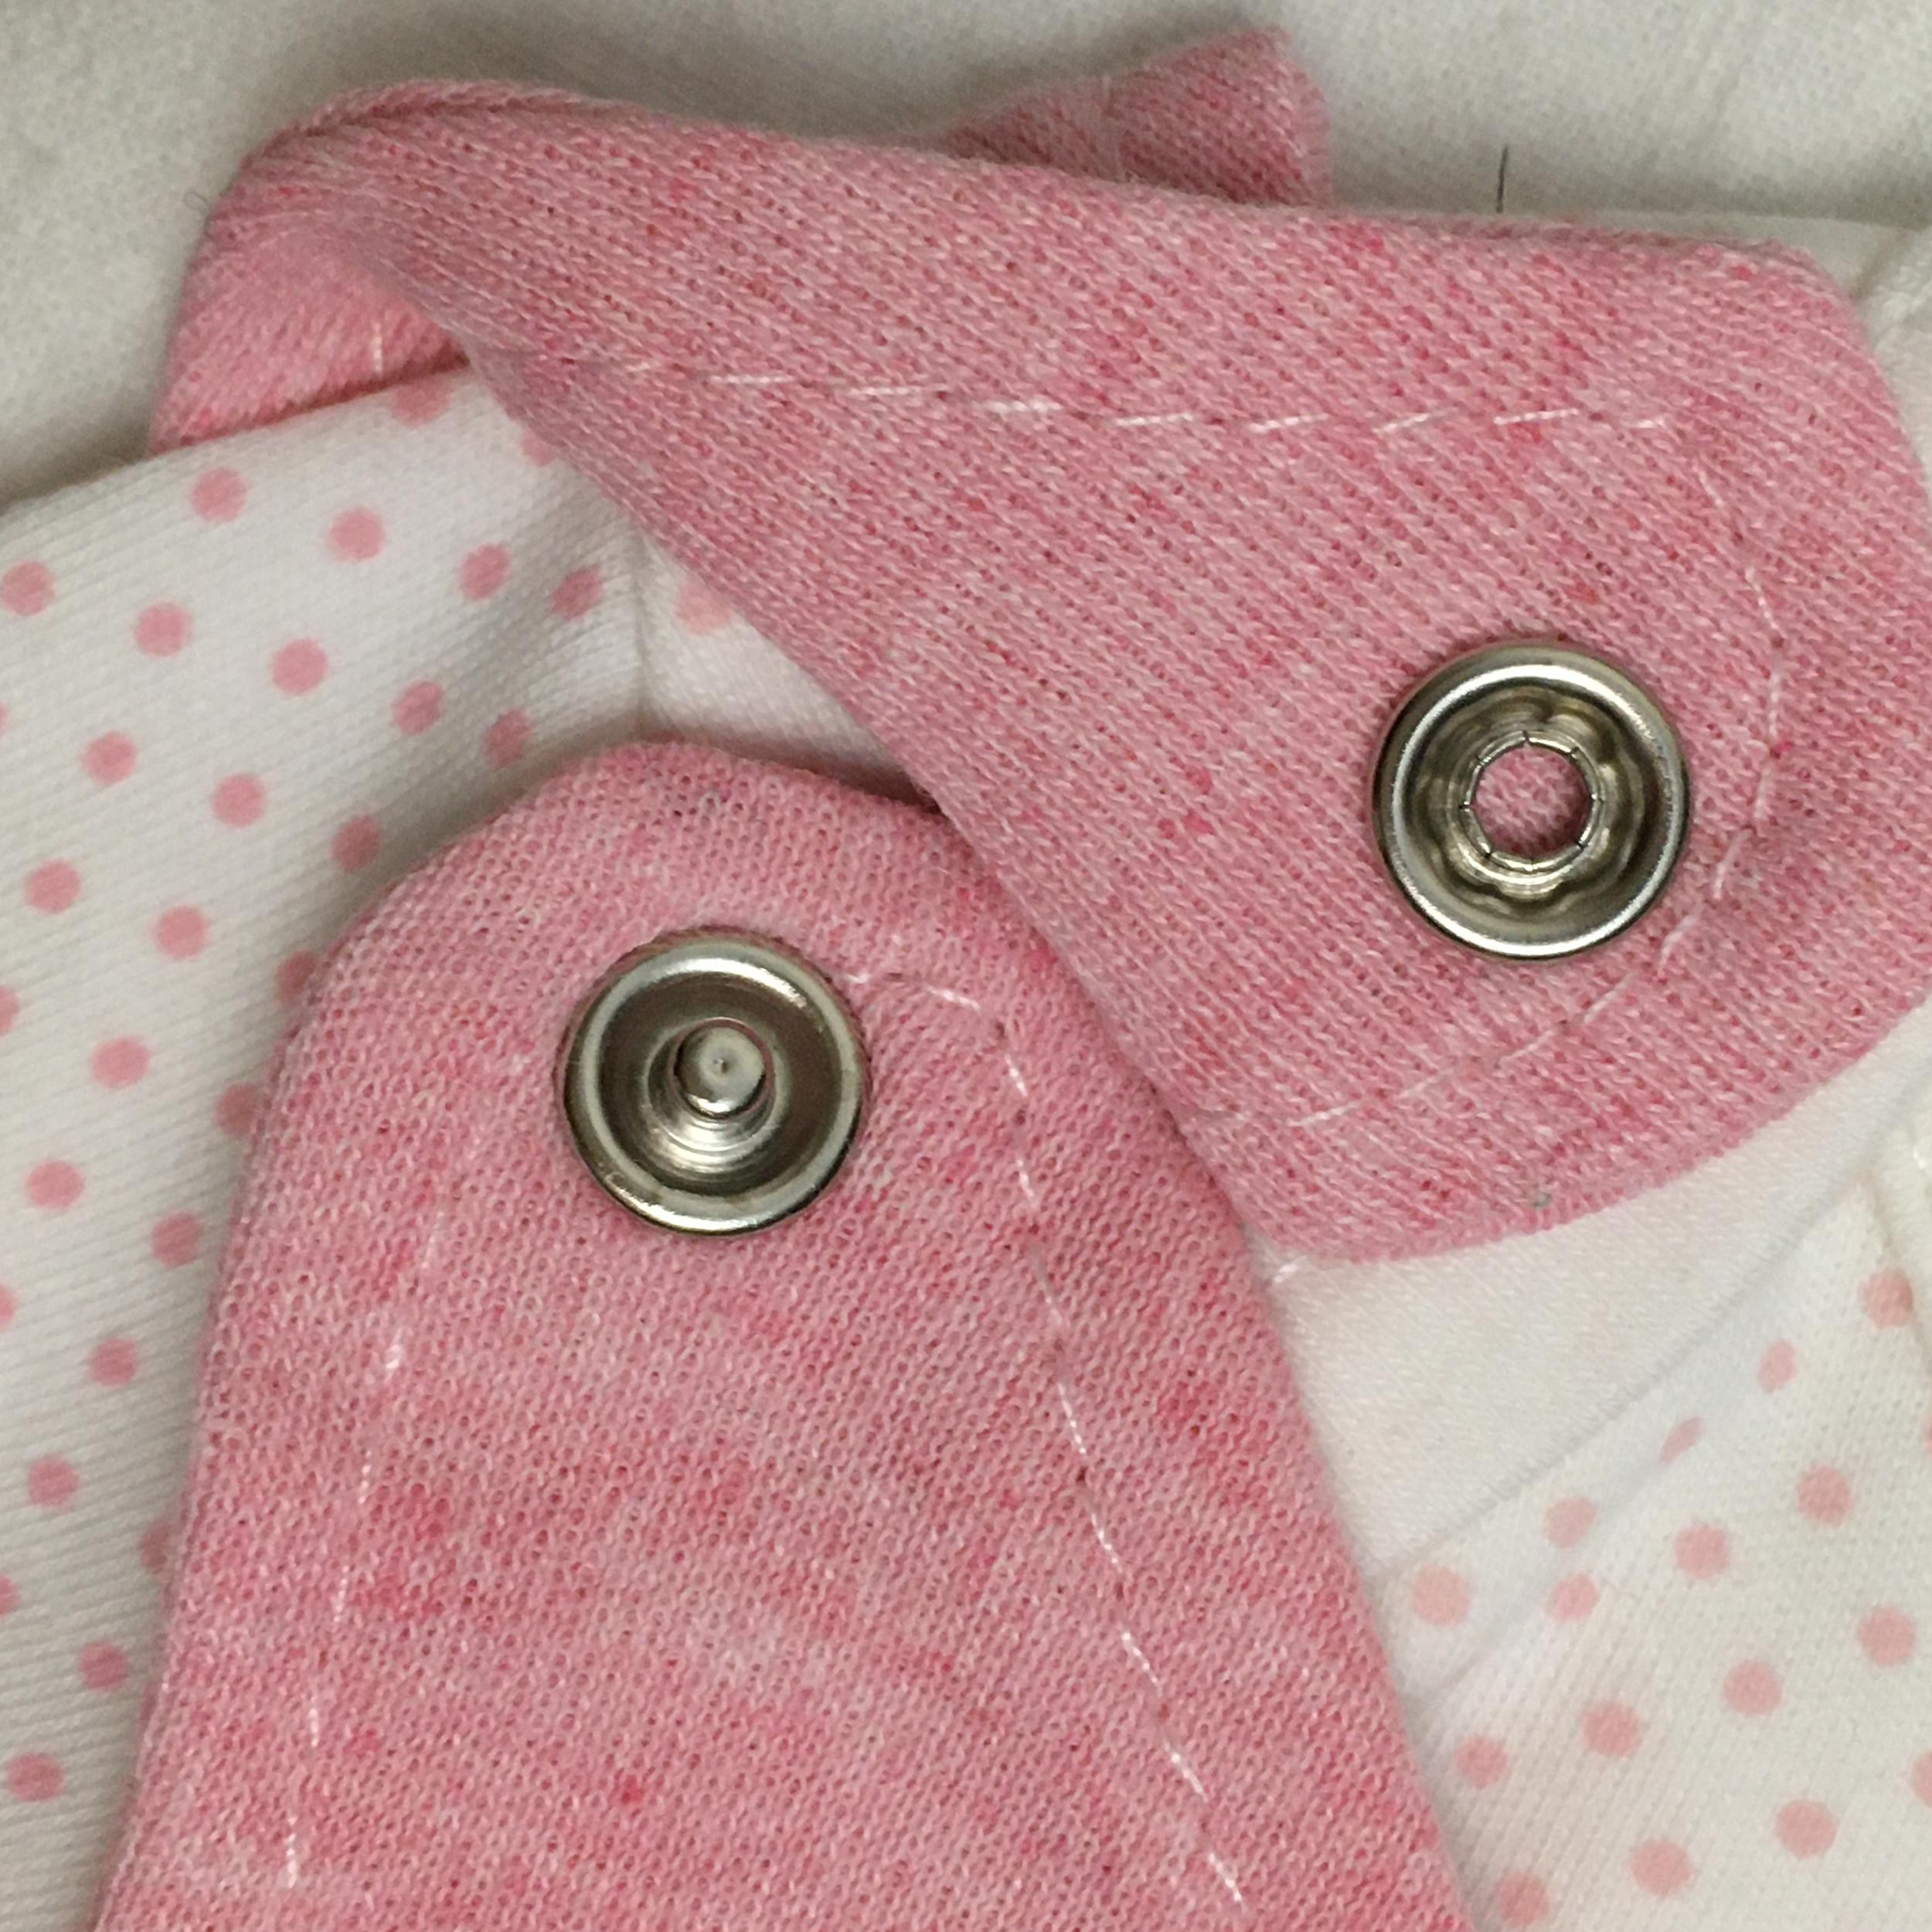 ست تیشرت و سرهمی نوزادی دخترانه مهتا کد KHS_85001